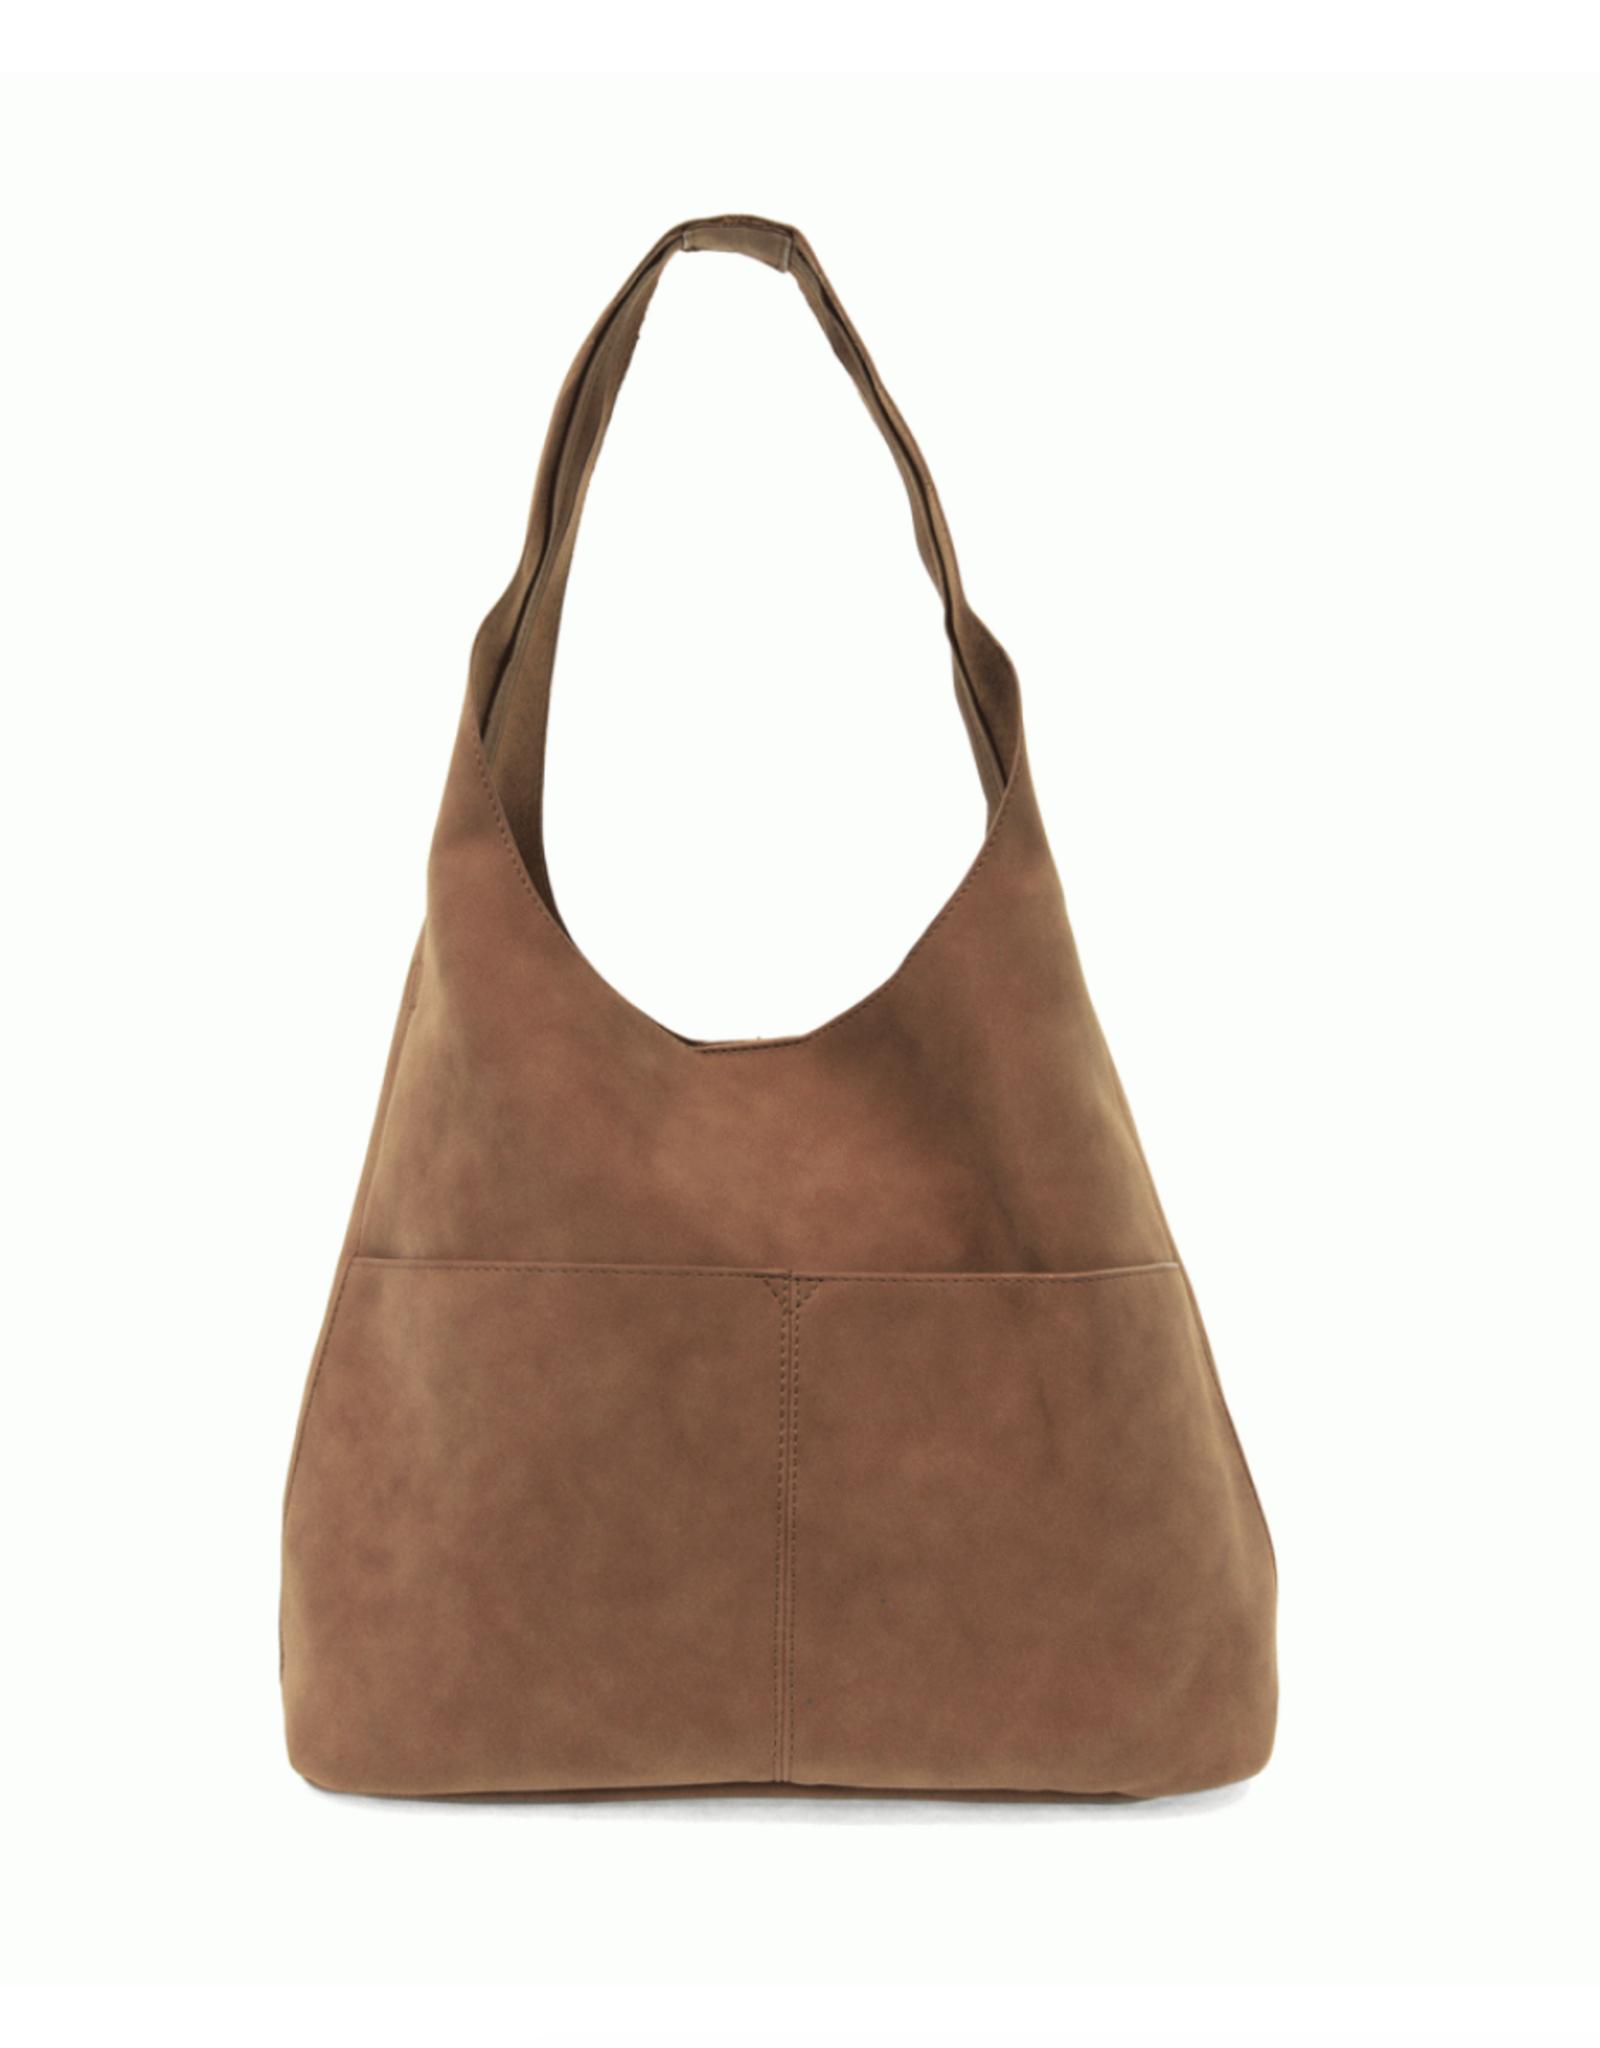 Jenny Suede Hobo Handbag : Latte